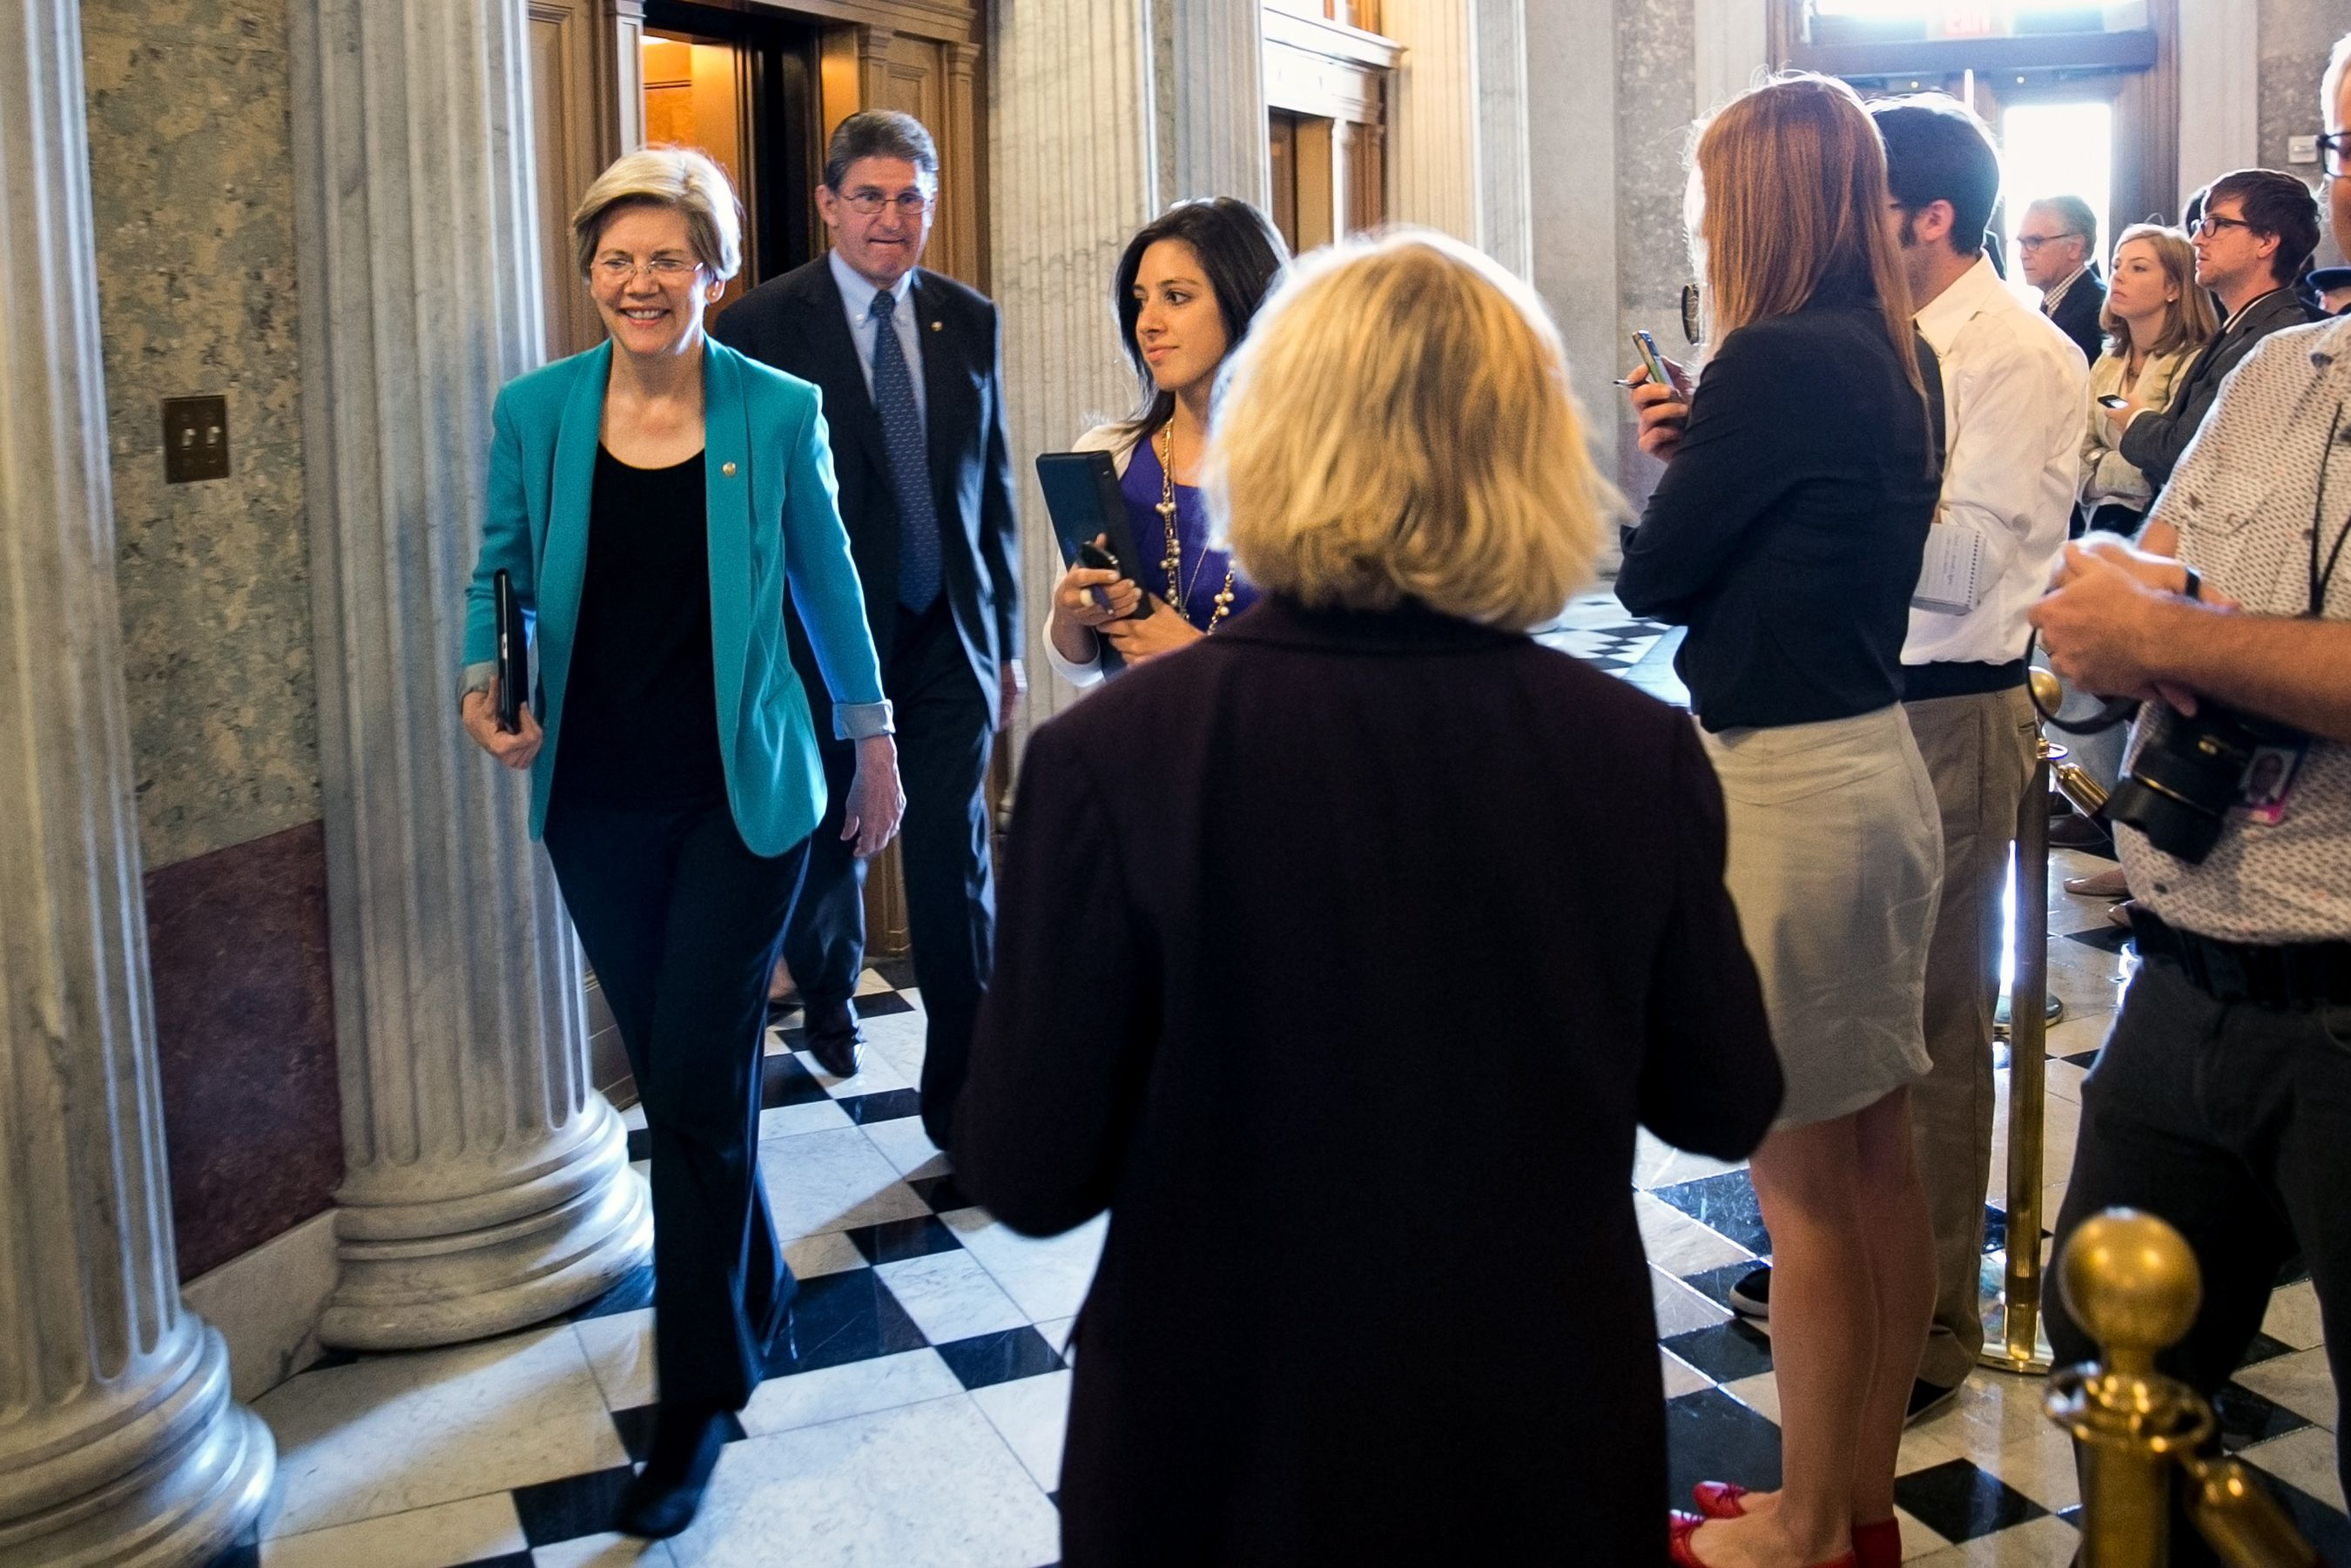 Senators Want Answers On Idea Website >> Senator Senator If It S In A Senate Hallway Elizabeth Warren